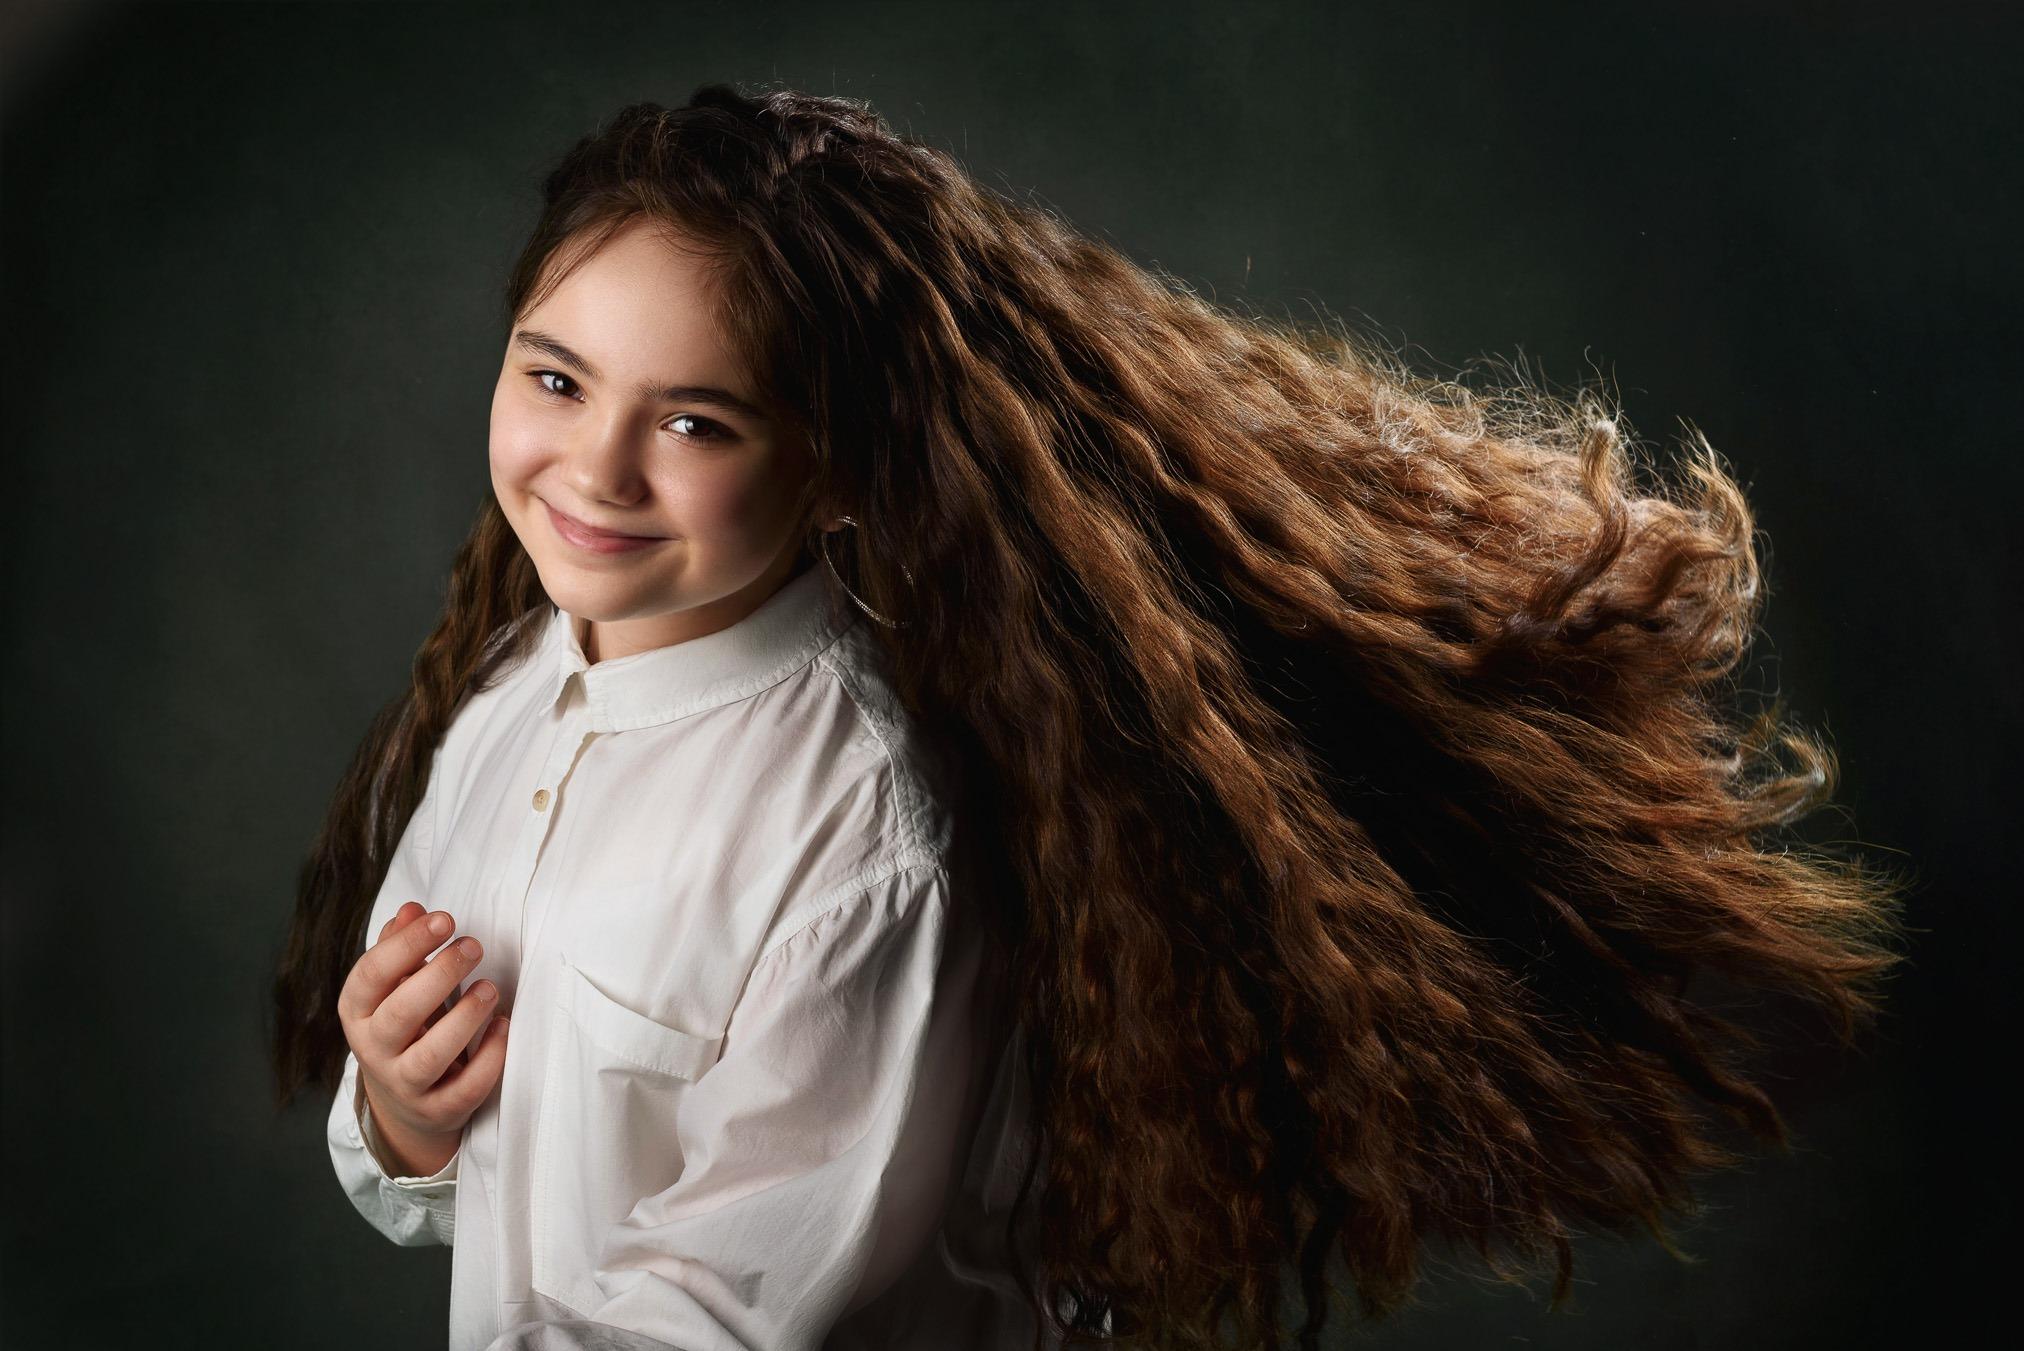 Amelia Borkowska (fot. Venter Photoart) - 3